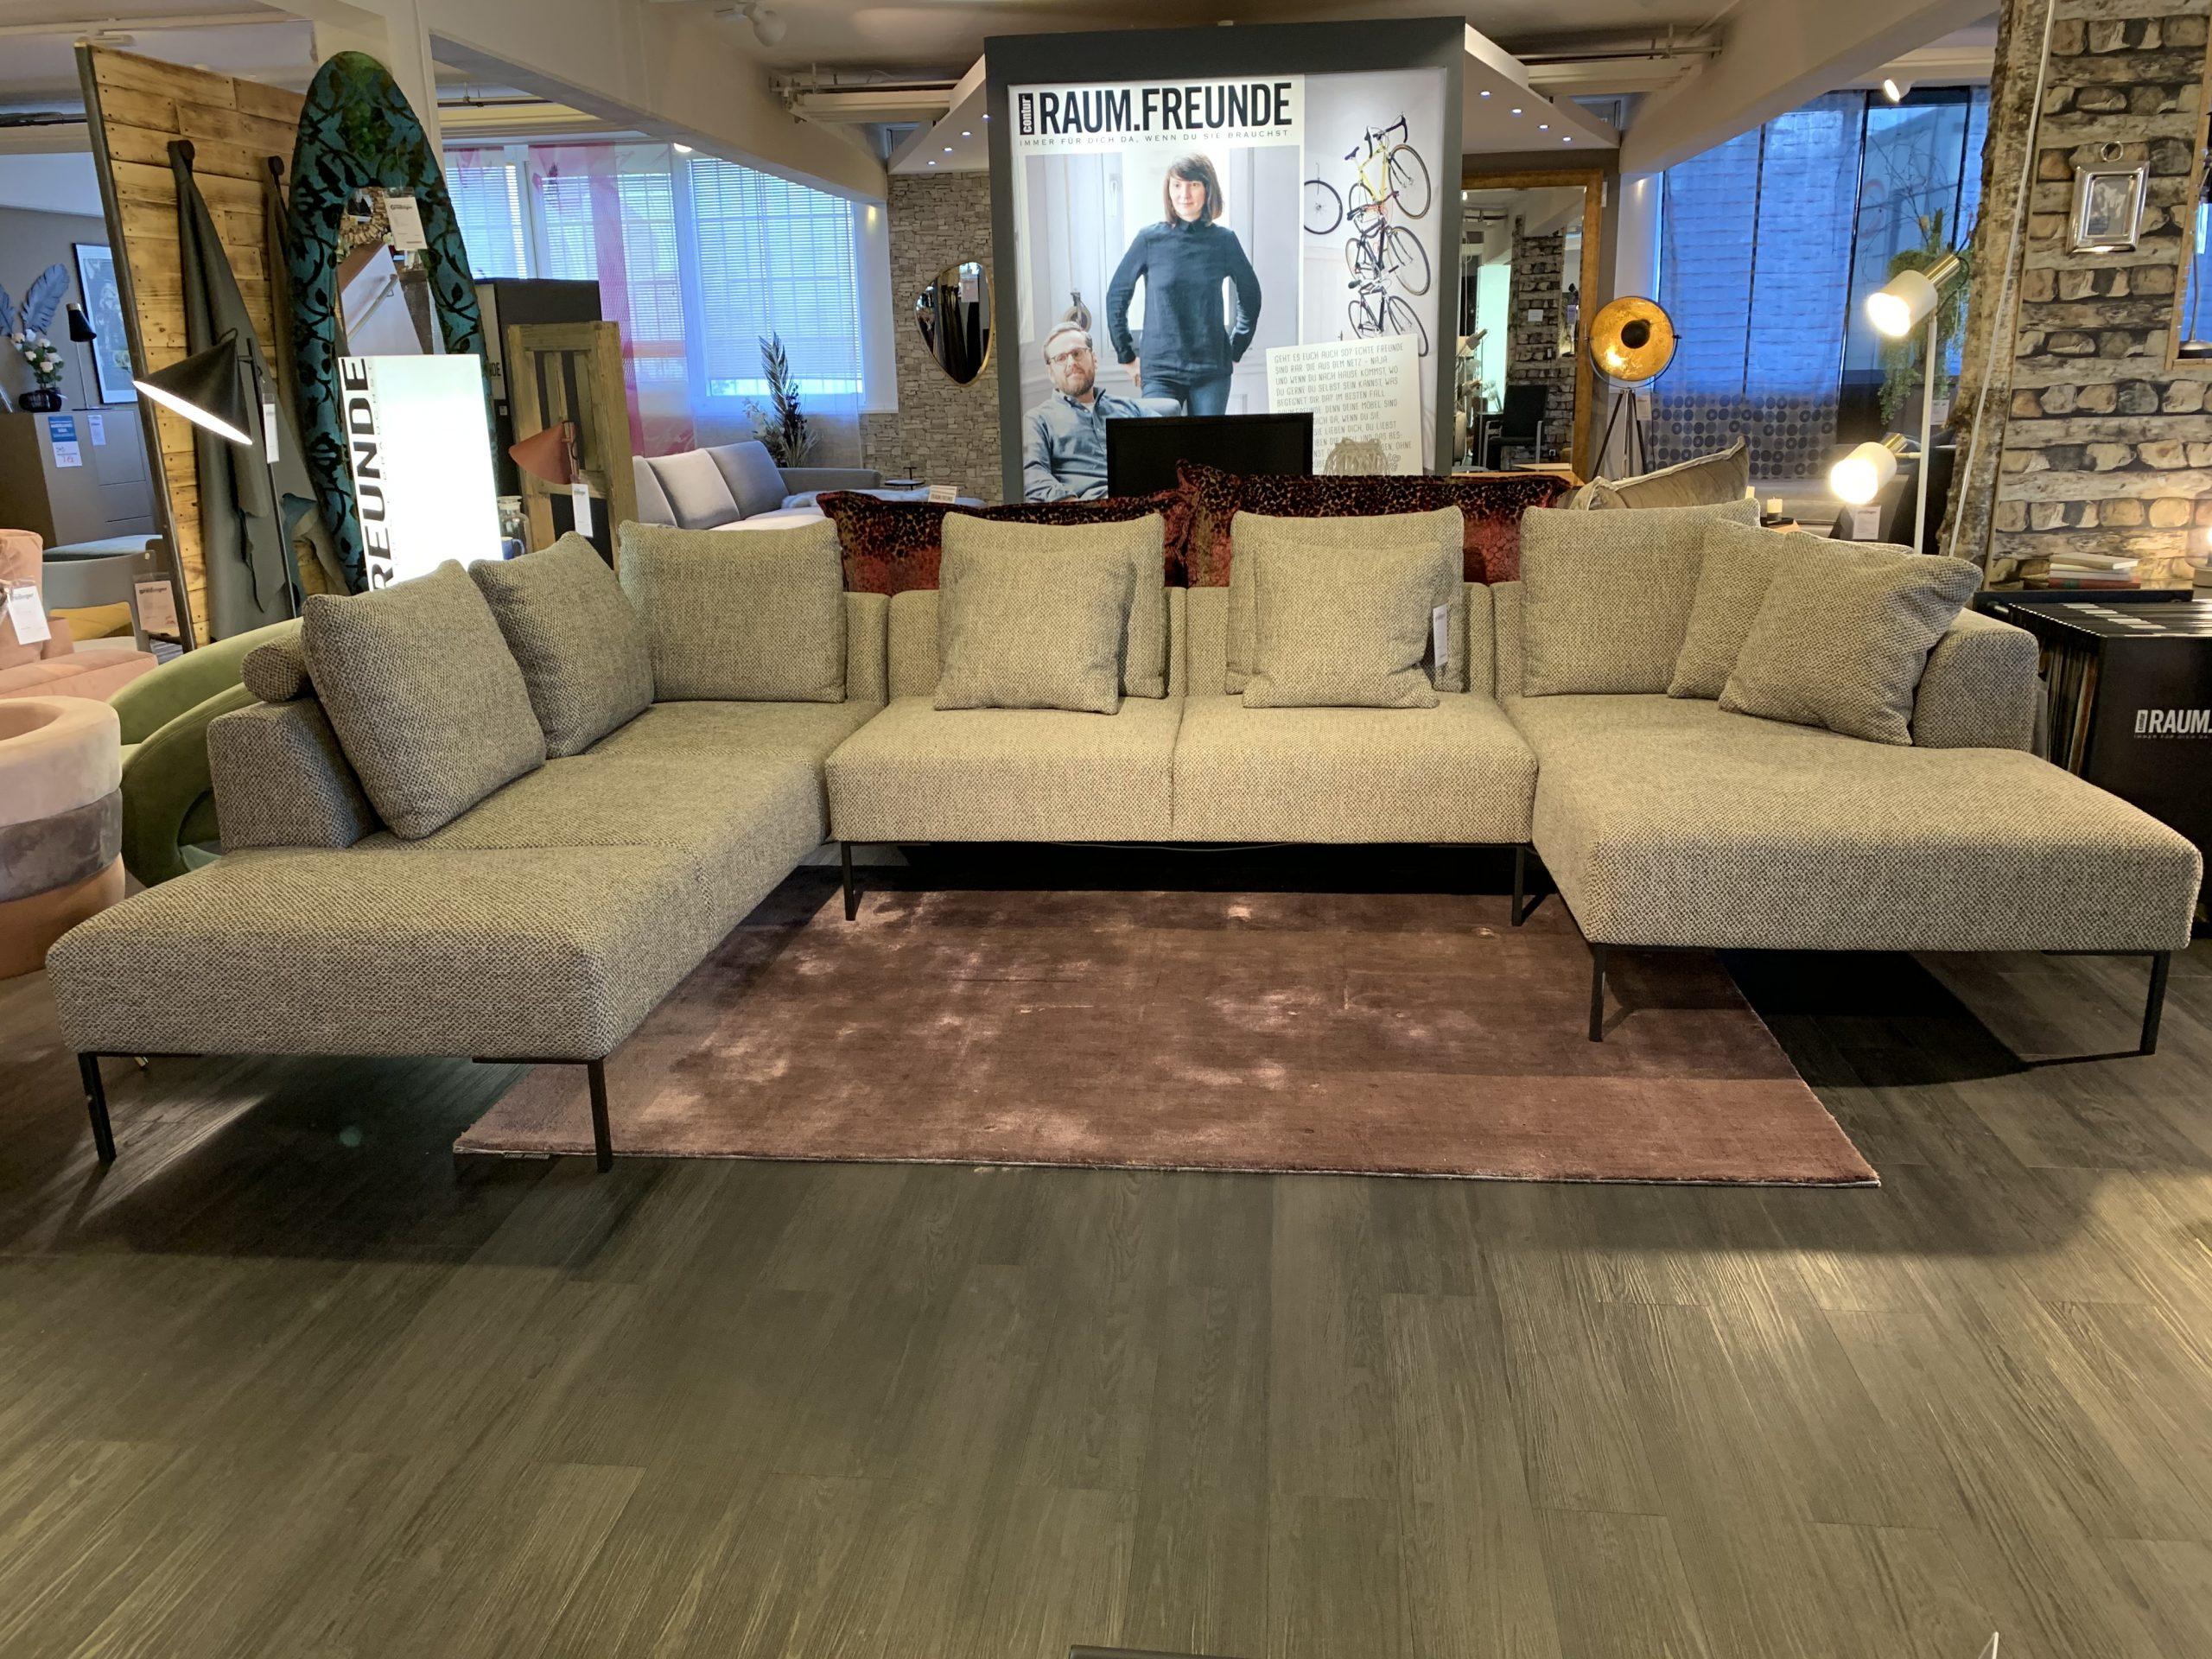 Sofa Raum.Freunde Matteo